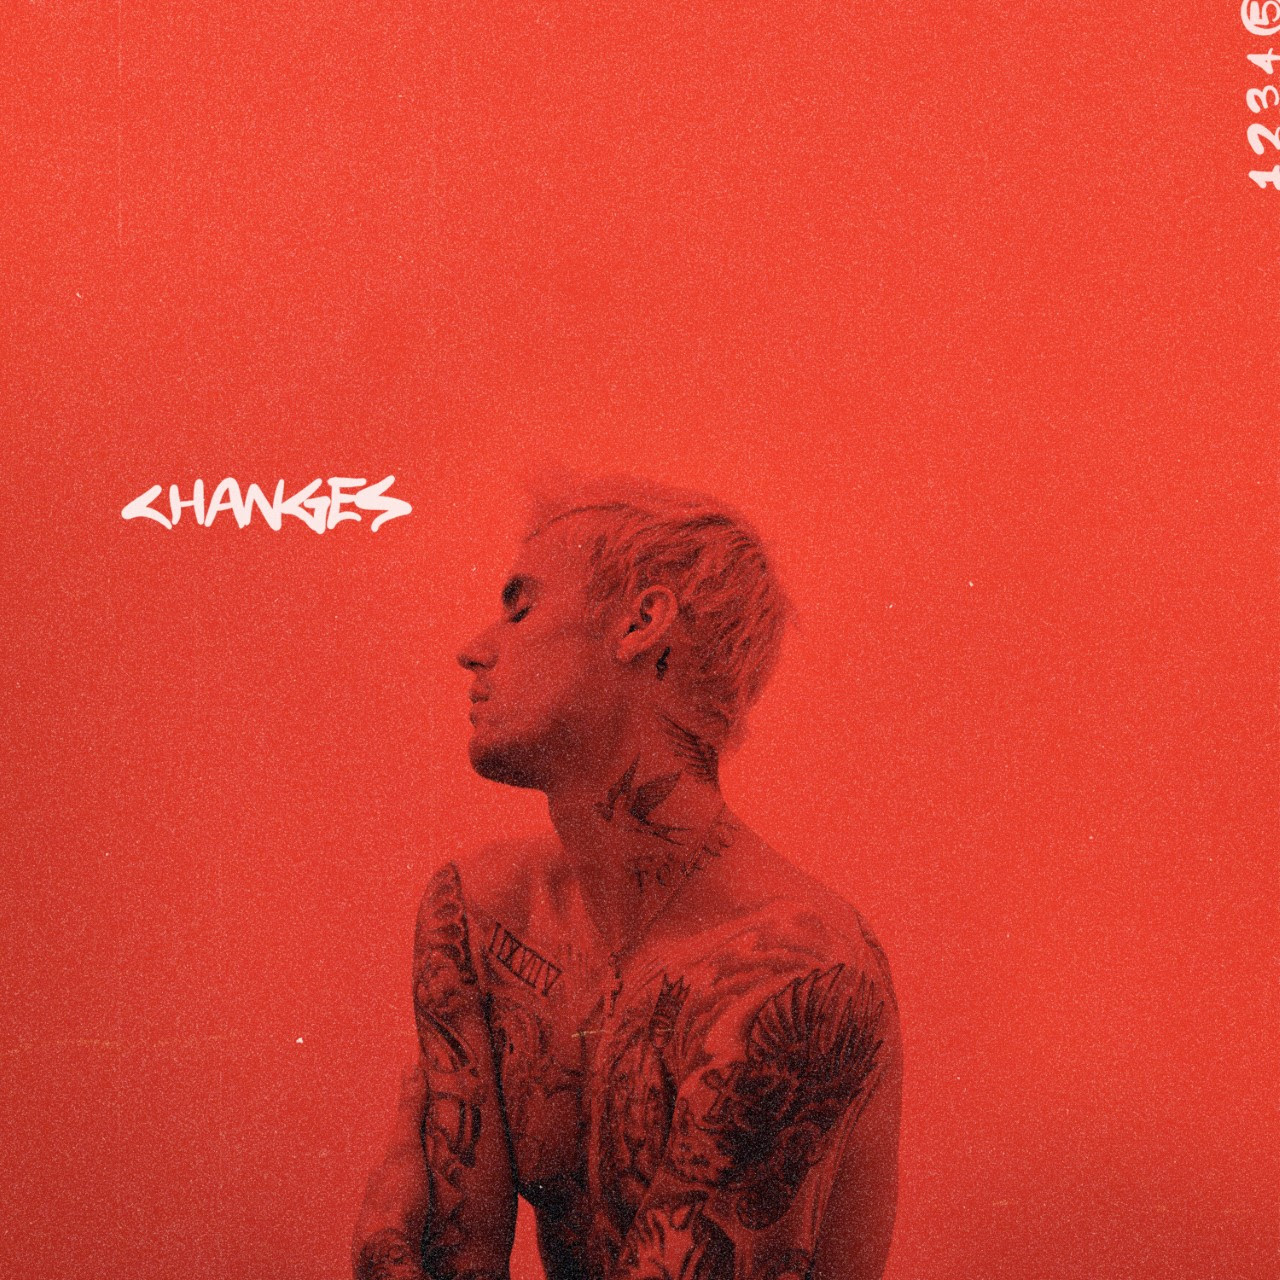 Justin Bieber Releases 5th Album 'Changes' ft Quavo, Post Malone + More